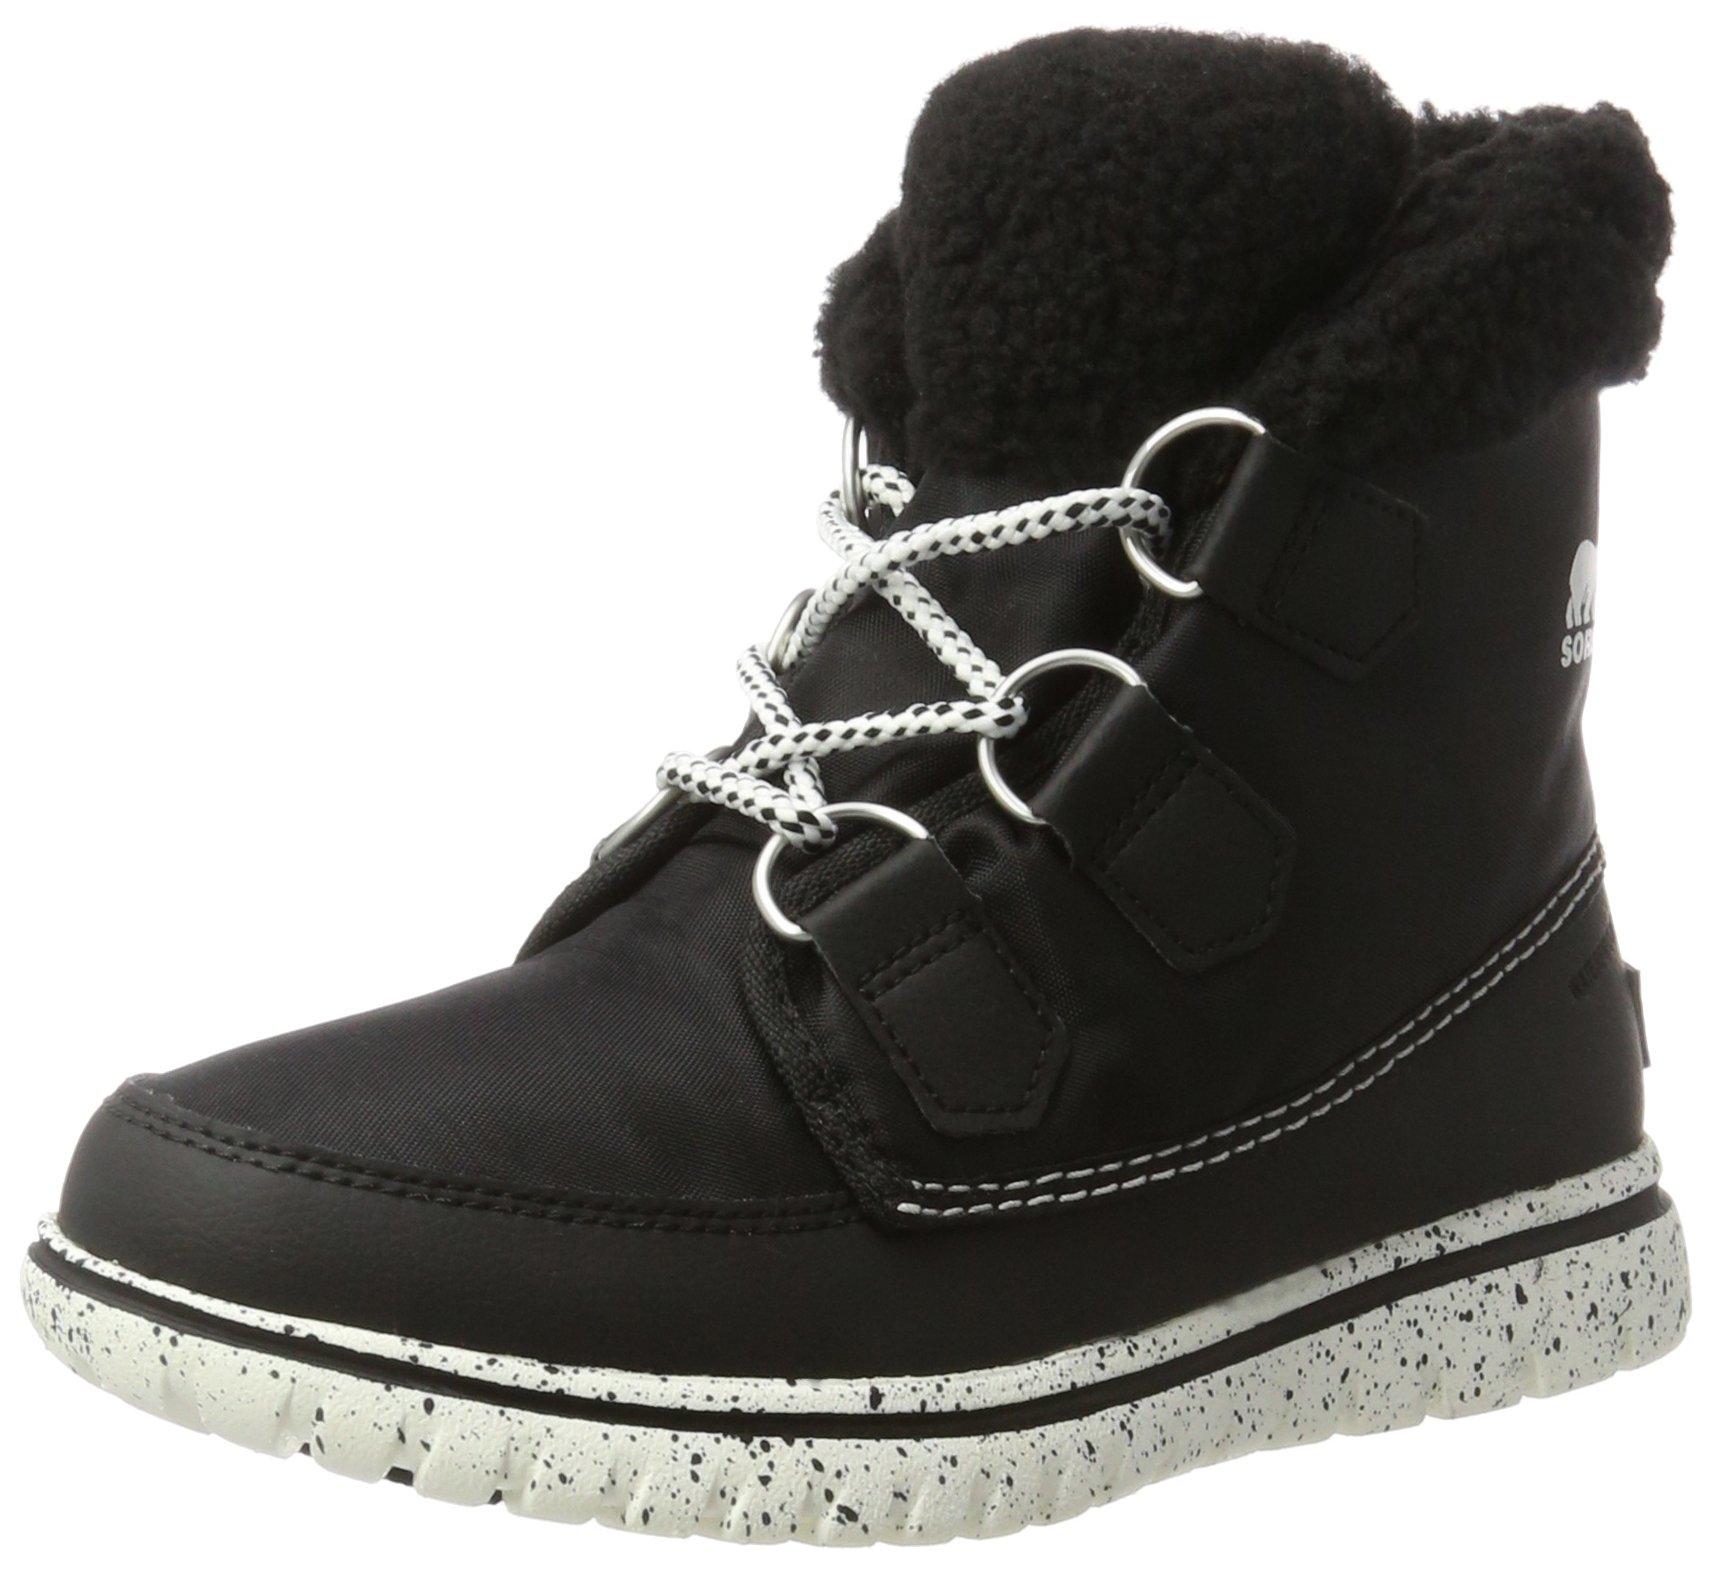 SOREL Women's Cozy Carnival Snow Boot, Black, 9.5 B(M) US